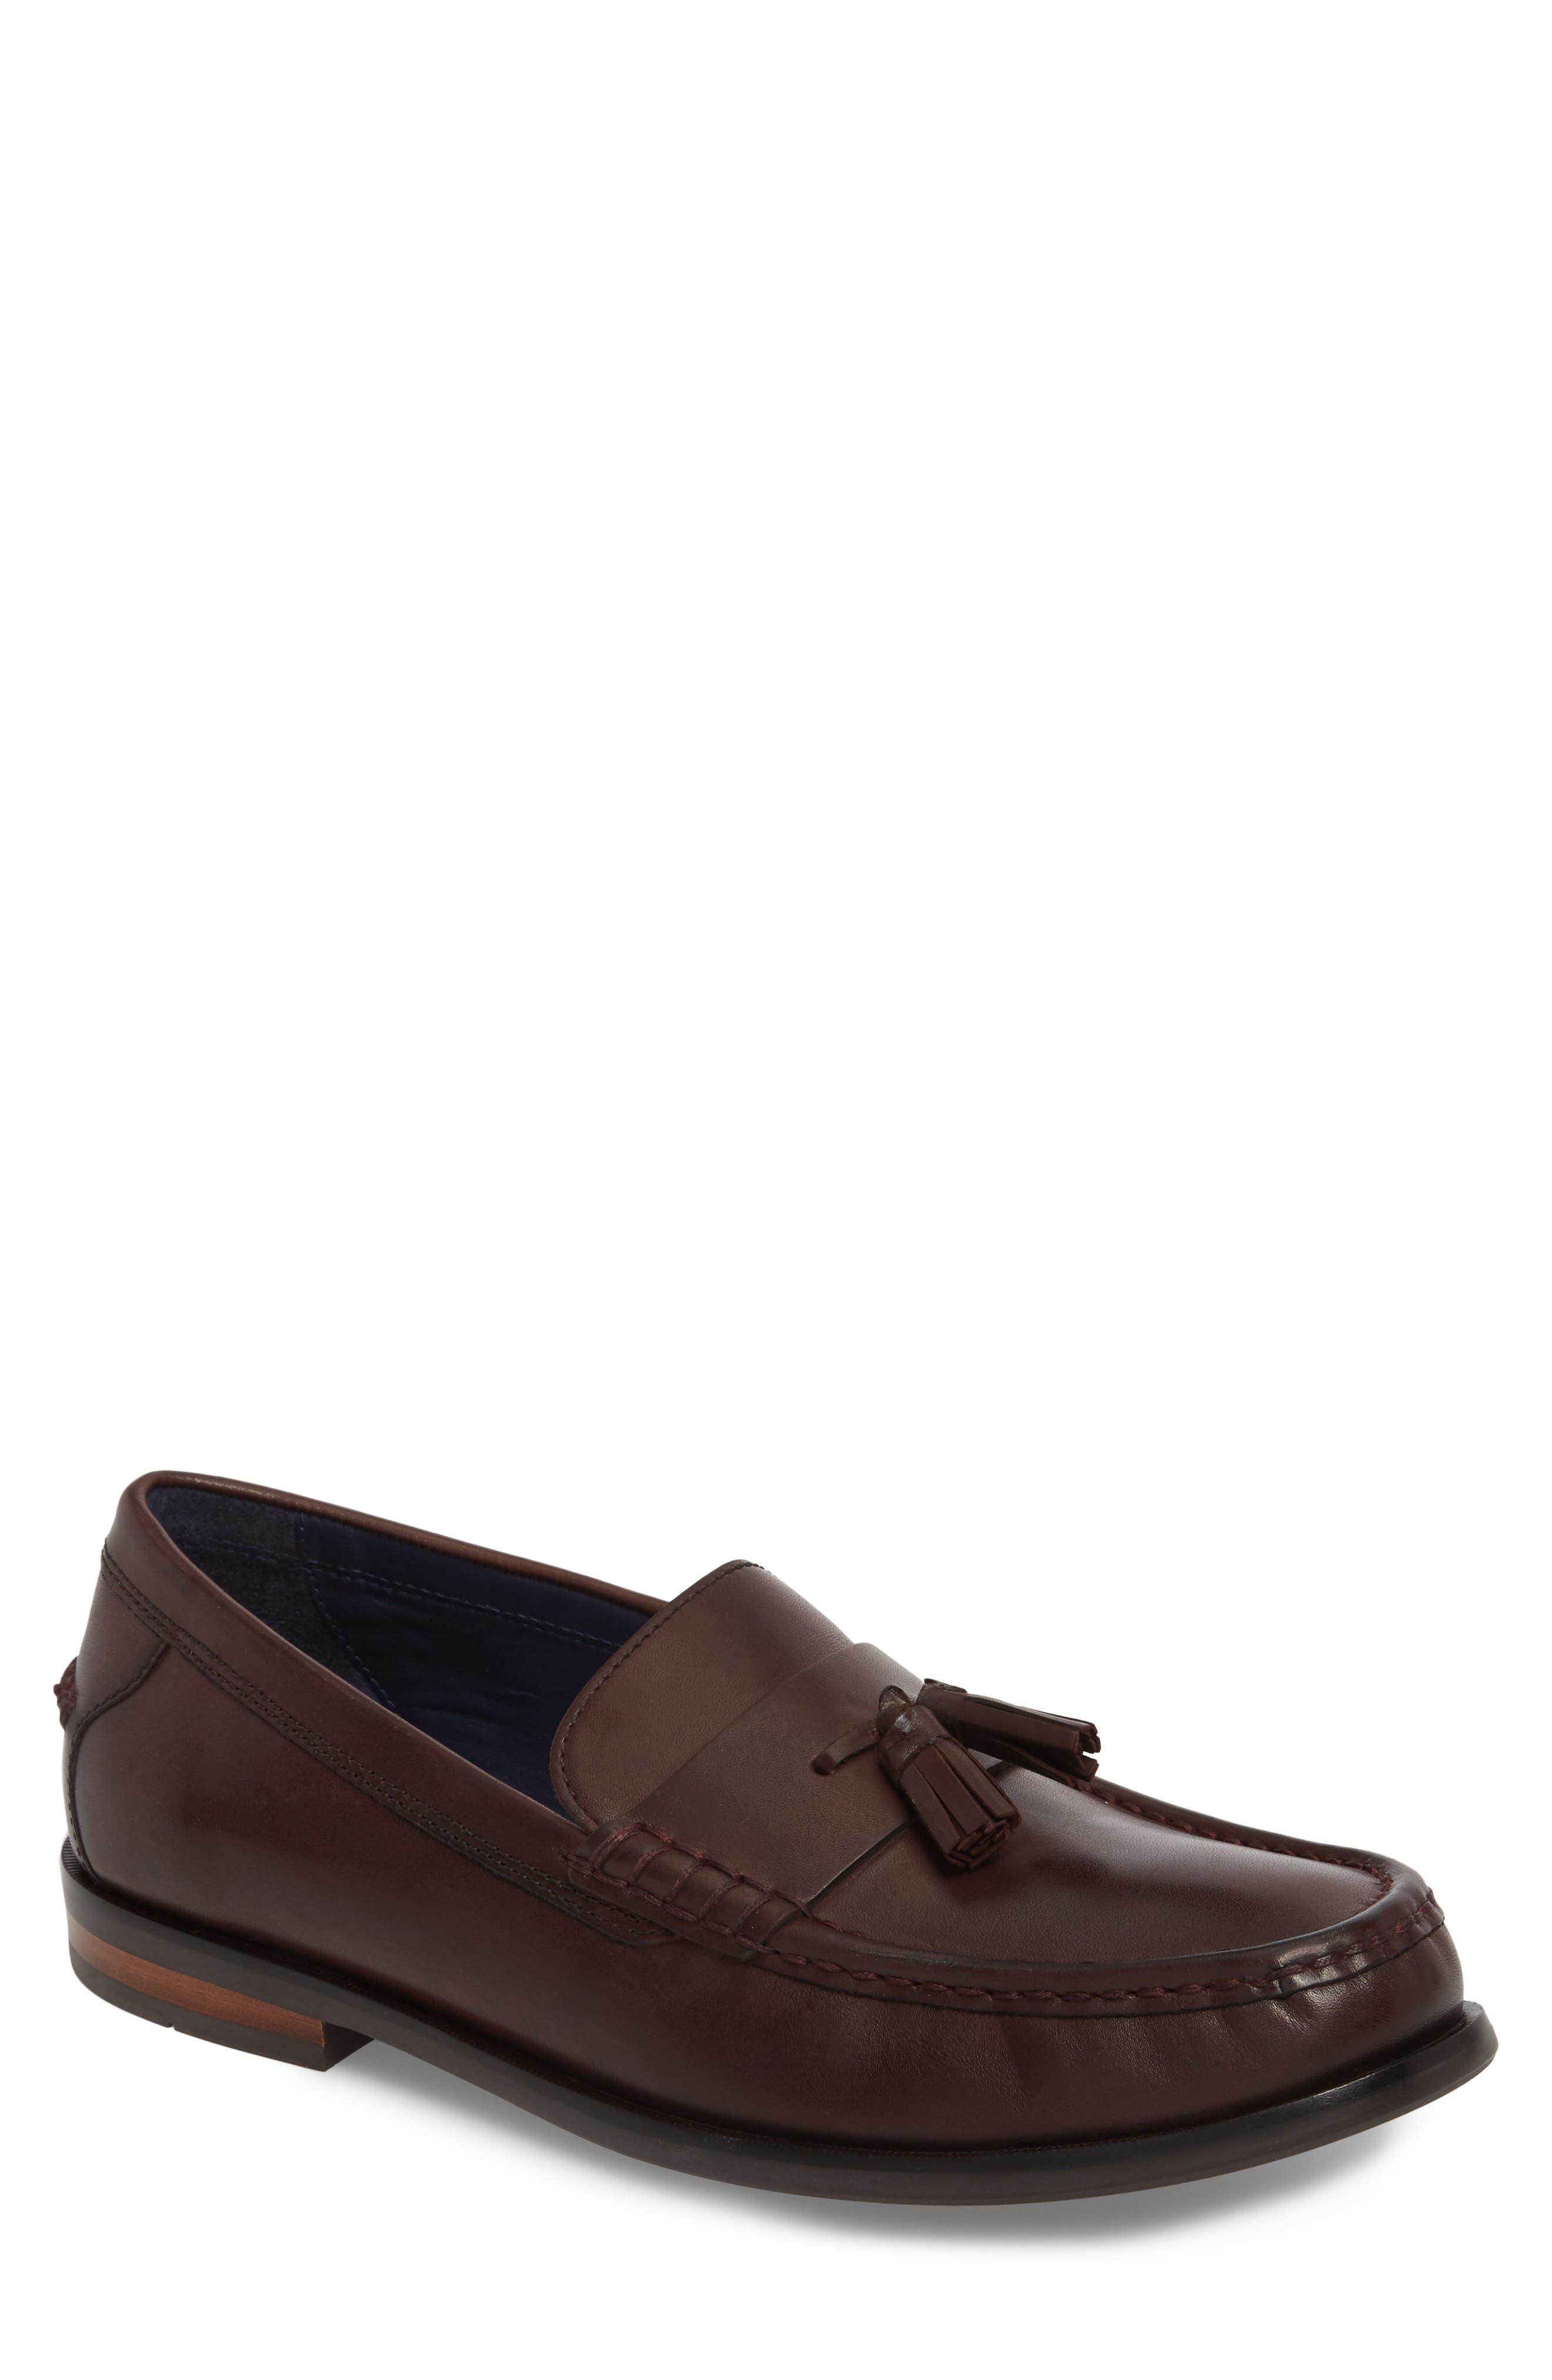 Pinch Friday Tassel Loafer,                         Main,                         color, Burgundy Leather